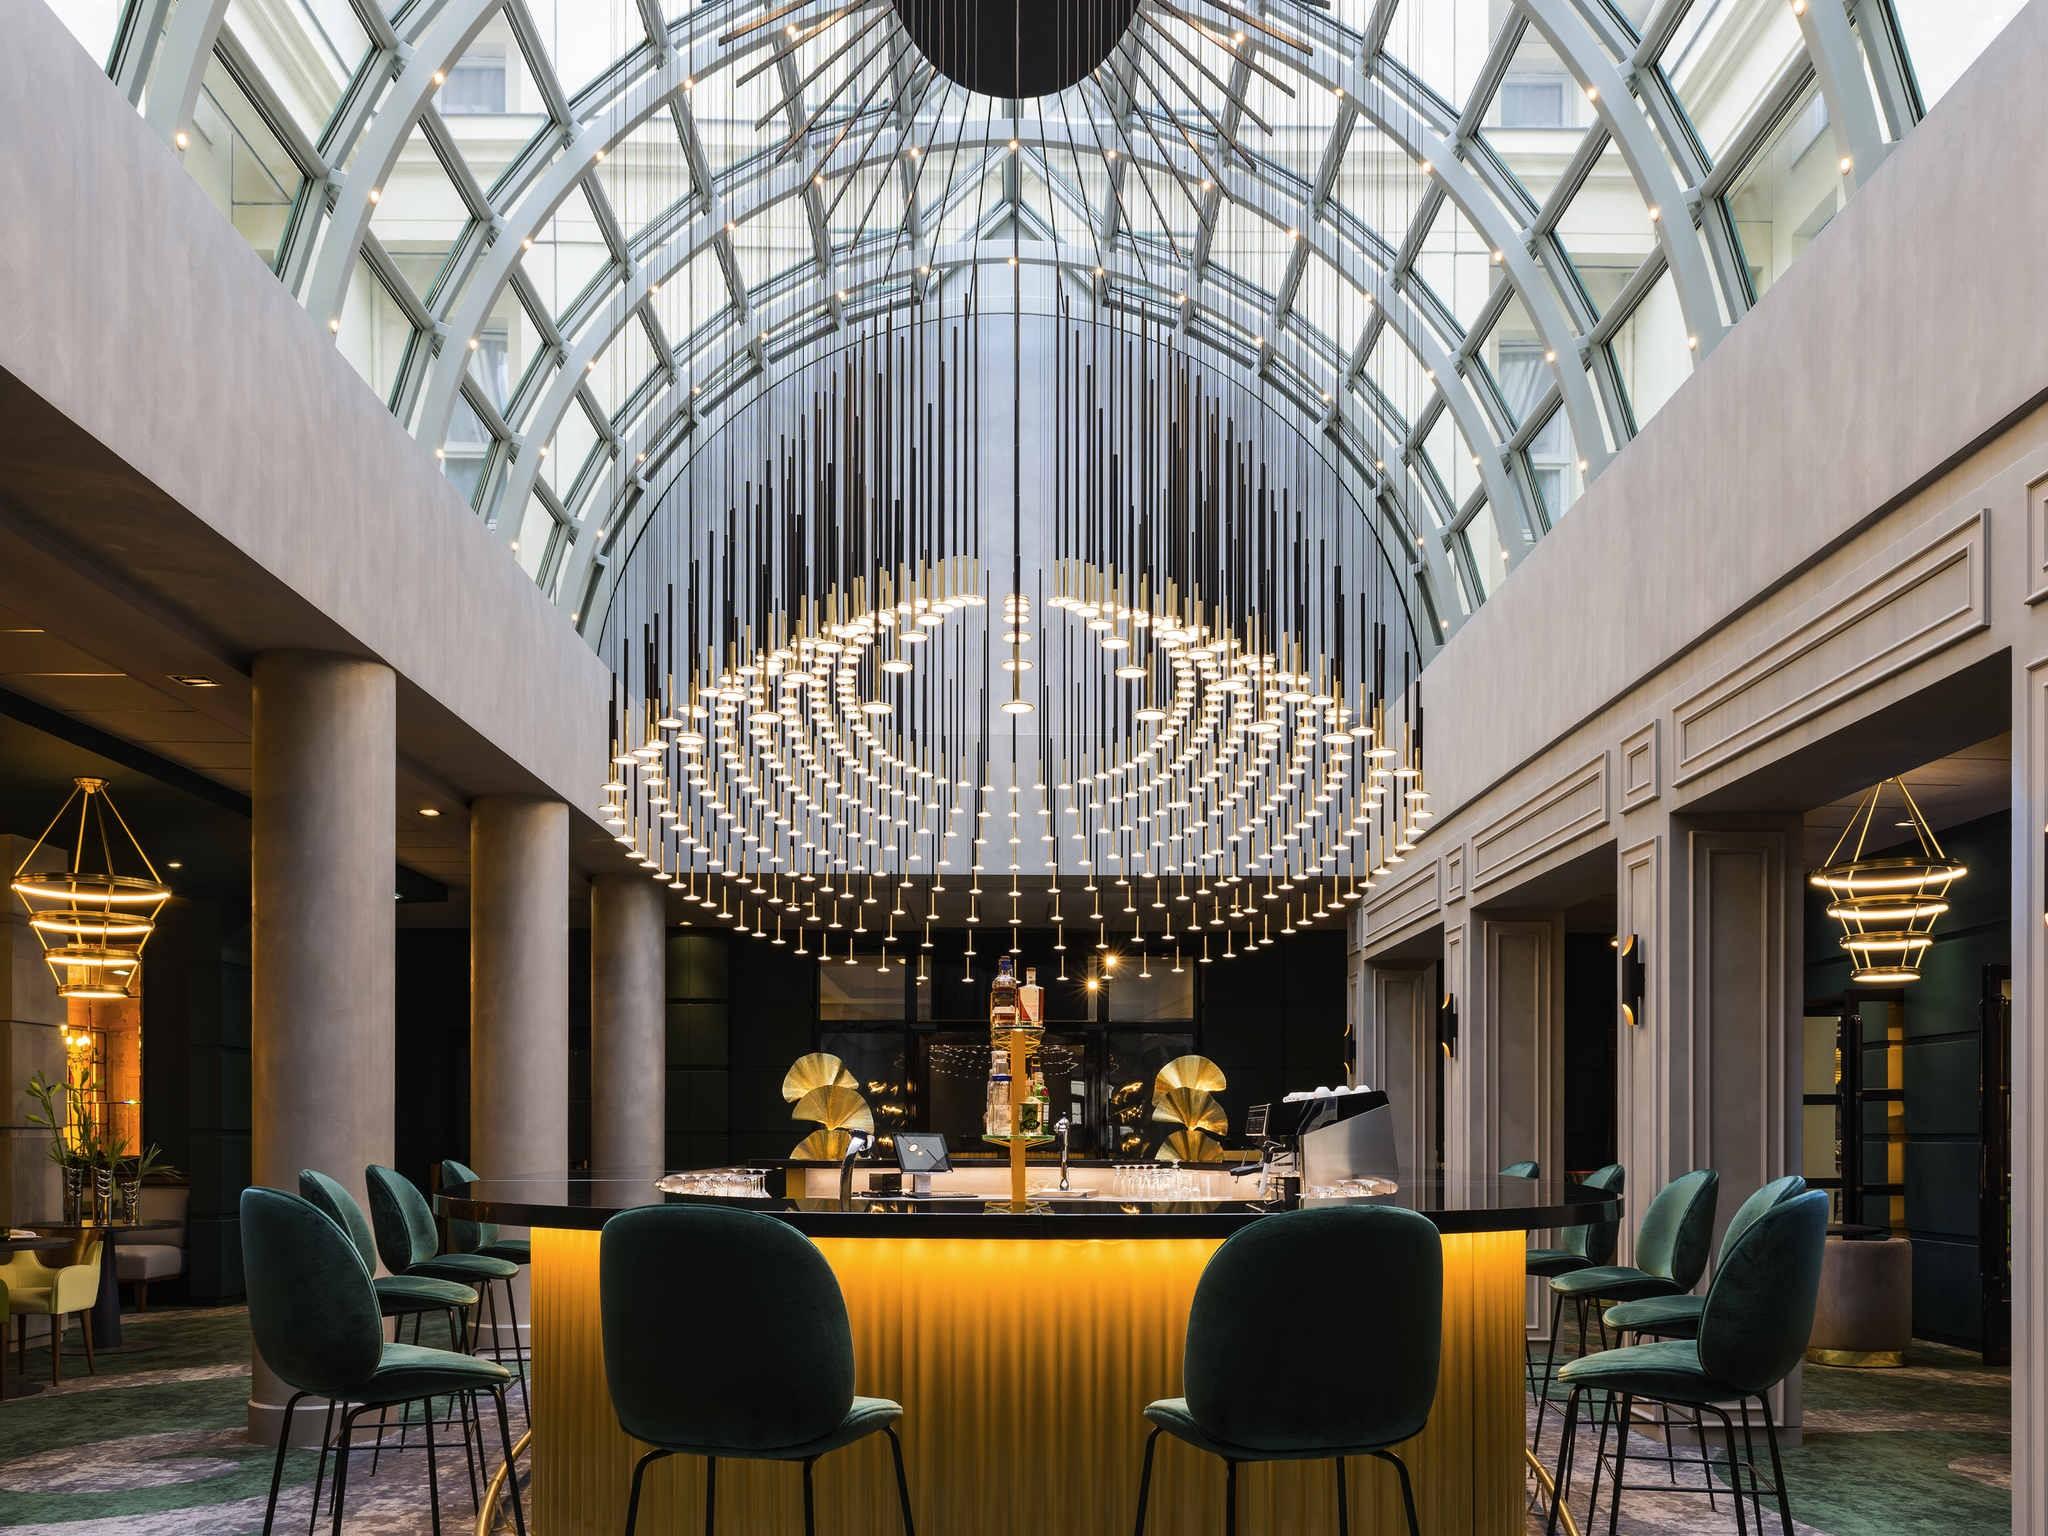 I.RAIN Enlightens Le Louis Versailles Château Hotel. To see more news about lighting decoration, subscribe our newsletter right now! #lelouisversailleschateau #irain #iraincustom #luxurychandelier #luxurybrands #luxurylighting #hallwaydecoratingideas #diningroomdecor #luxuryhotel